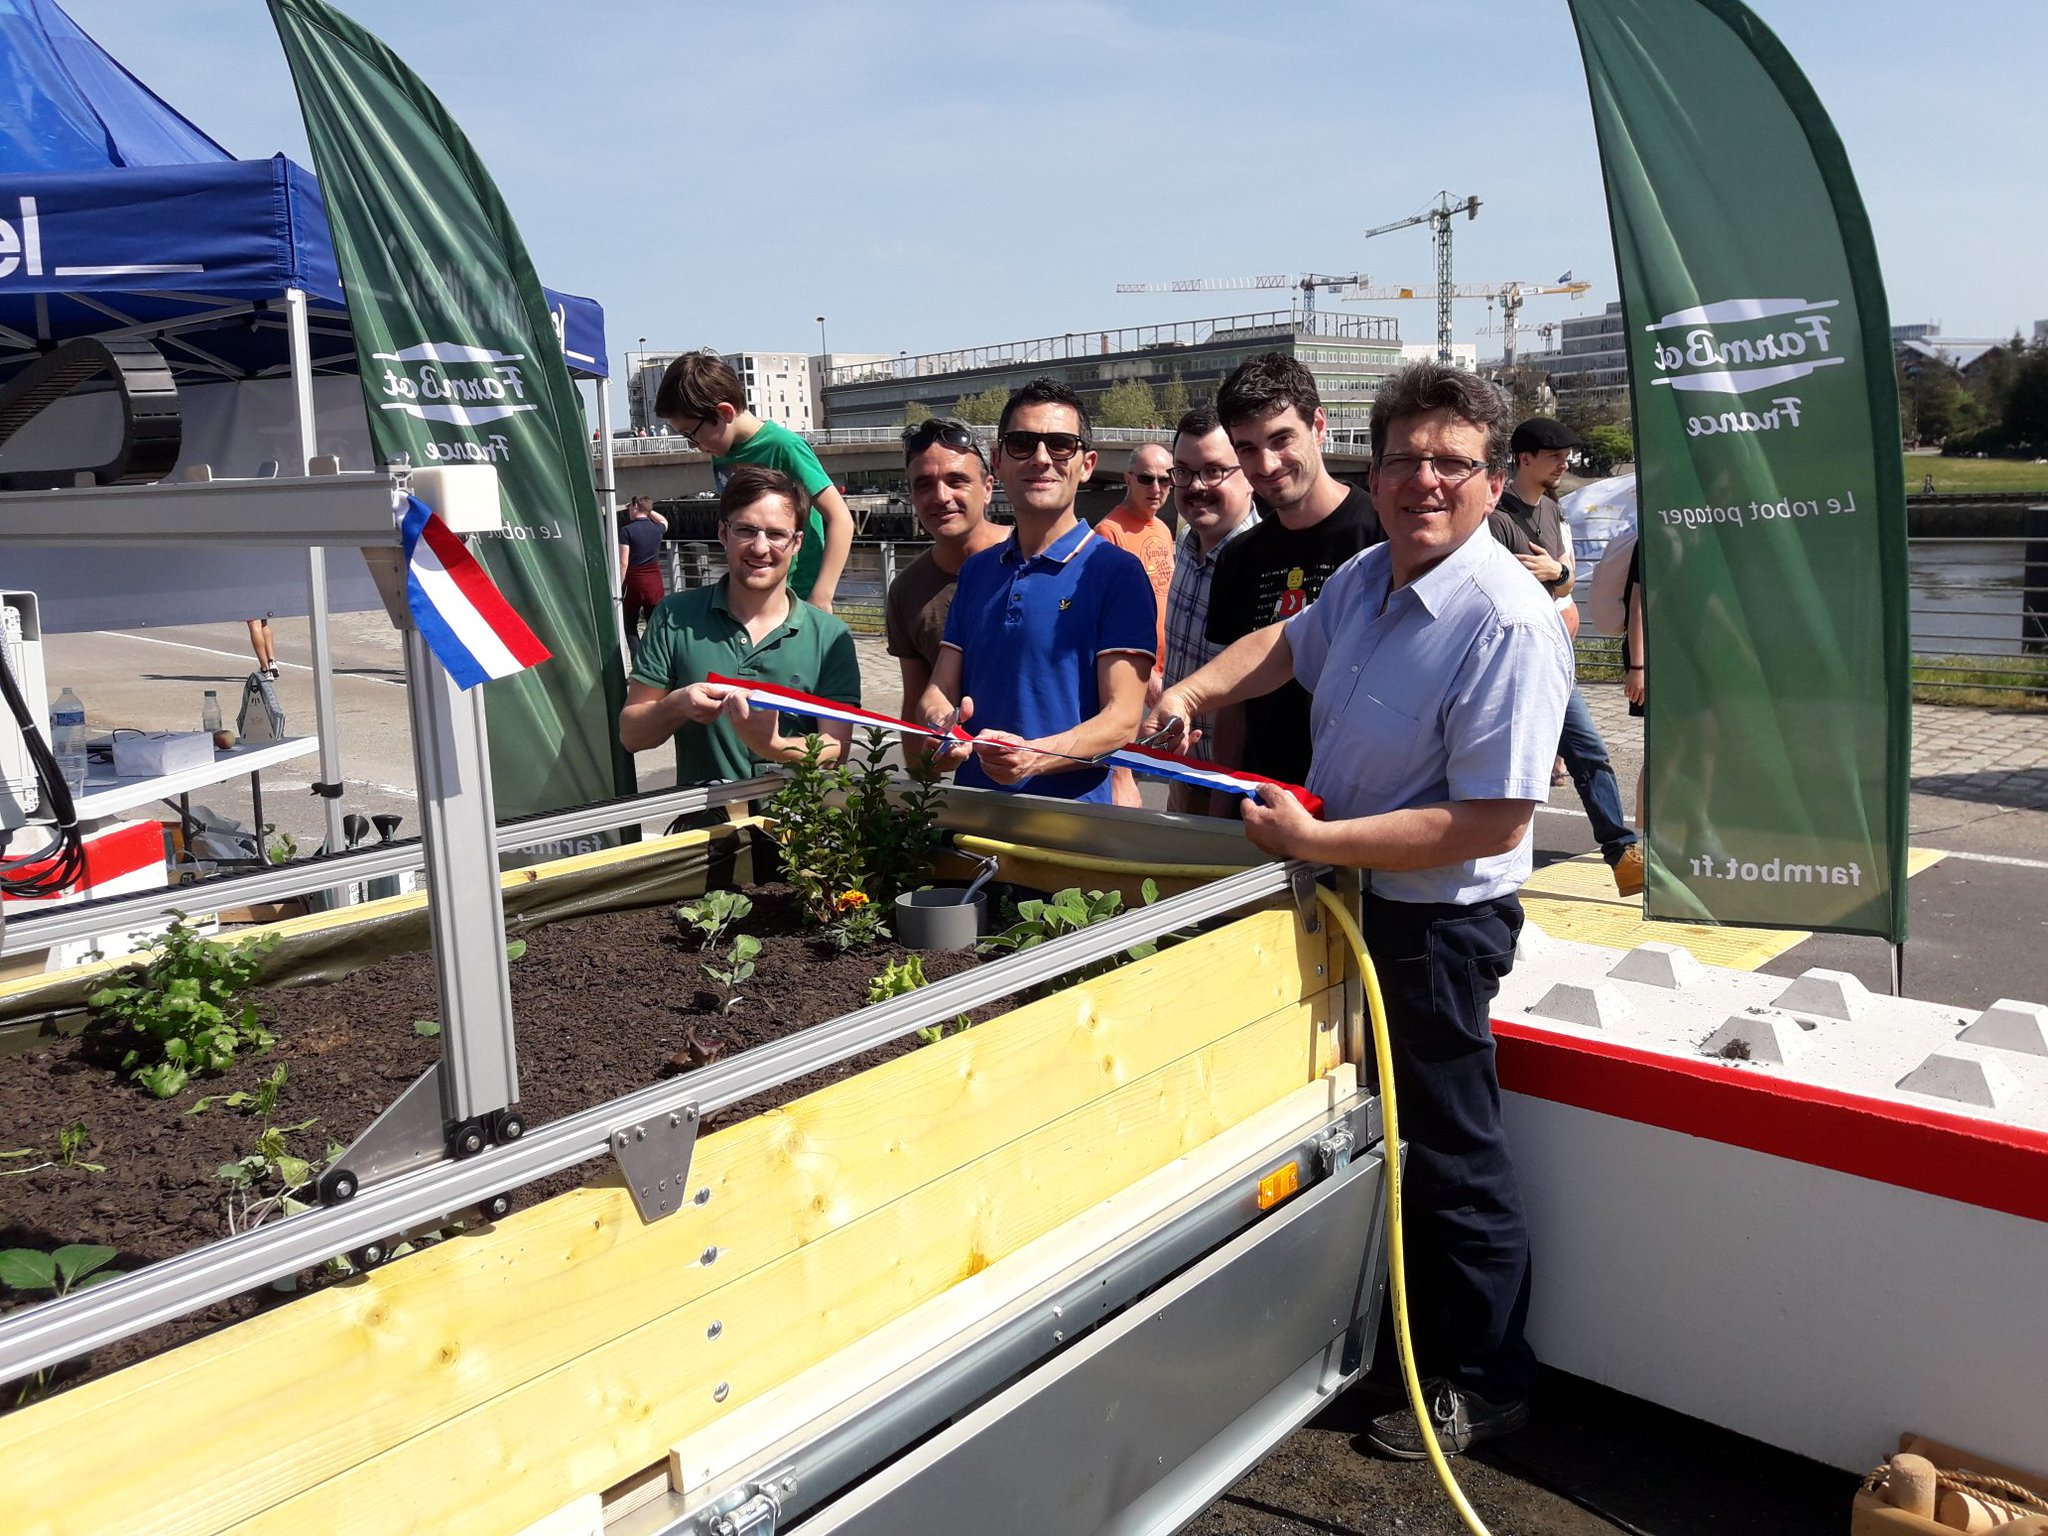 Inauguration du Farmbot 1.3 de l'IUT de l'Université de Nantes